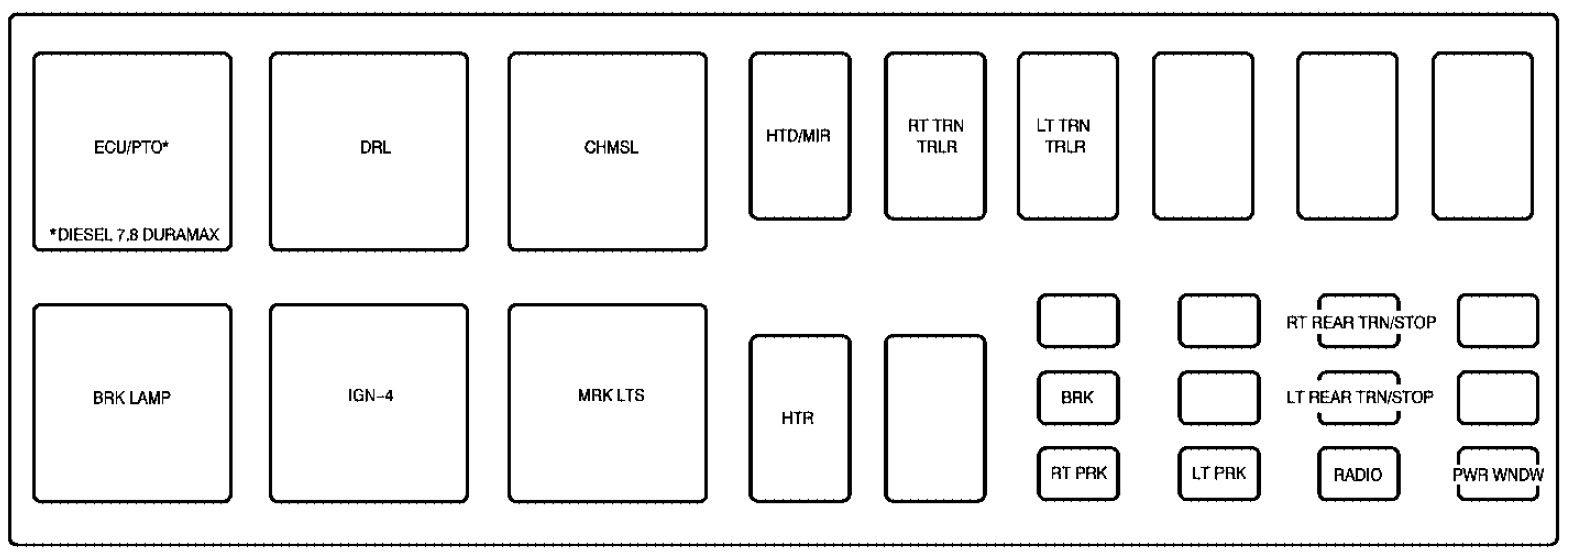 Gmc C7500 Fuse Box Wiring Diagram Schematic Advice Visit A Advice Visit A Aliceviola It